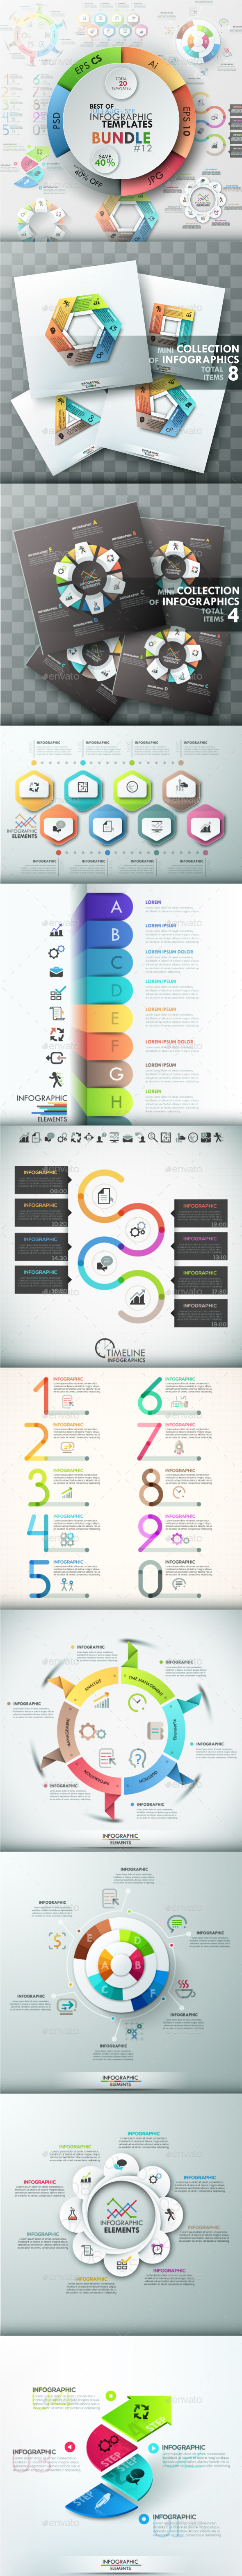 The Twelfth Bundle Of Bestsellers - Infographics